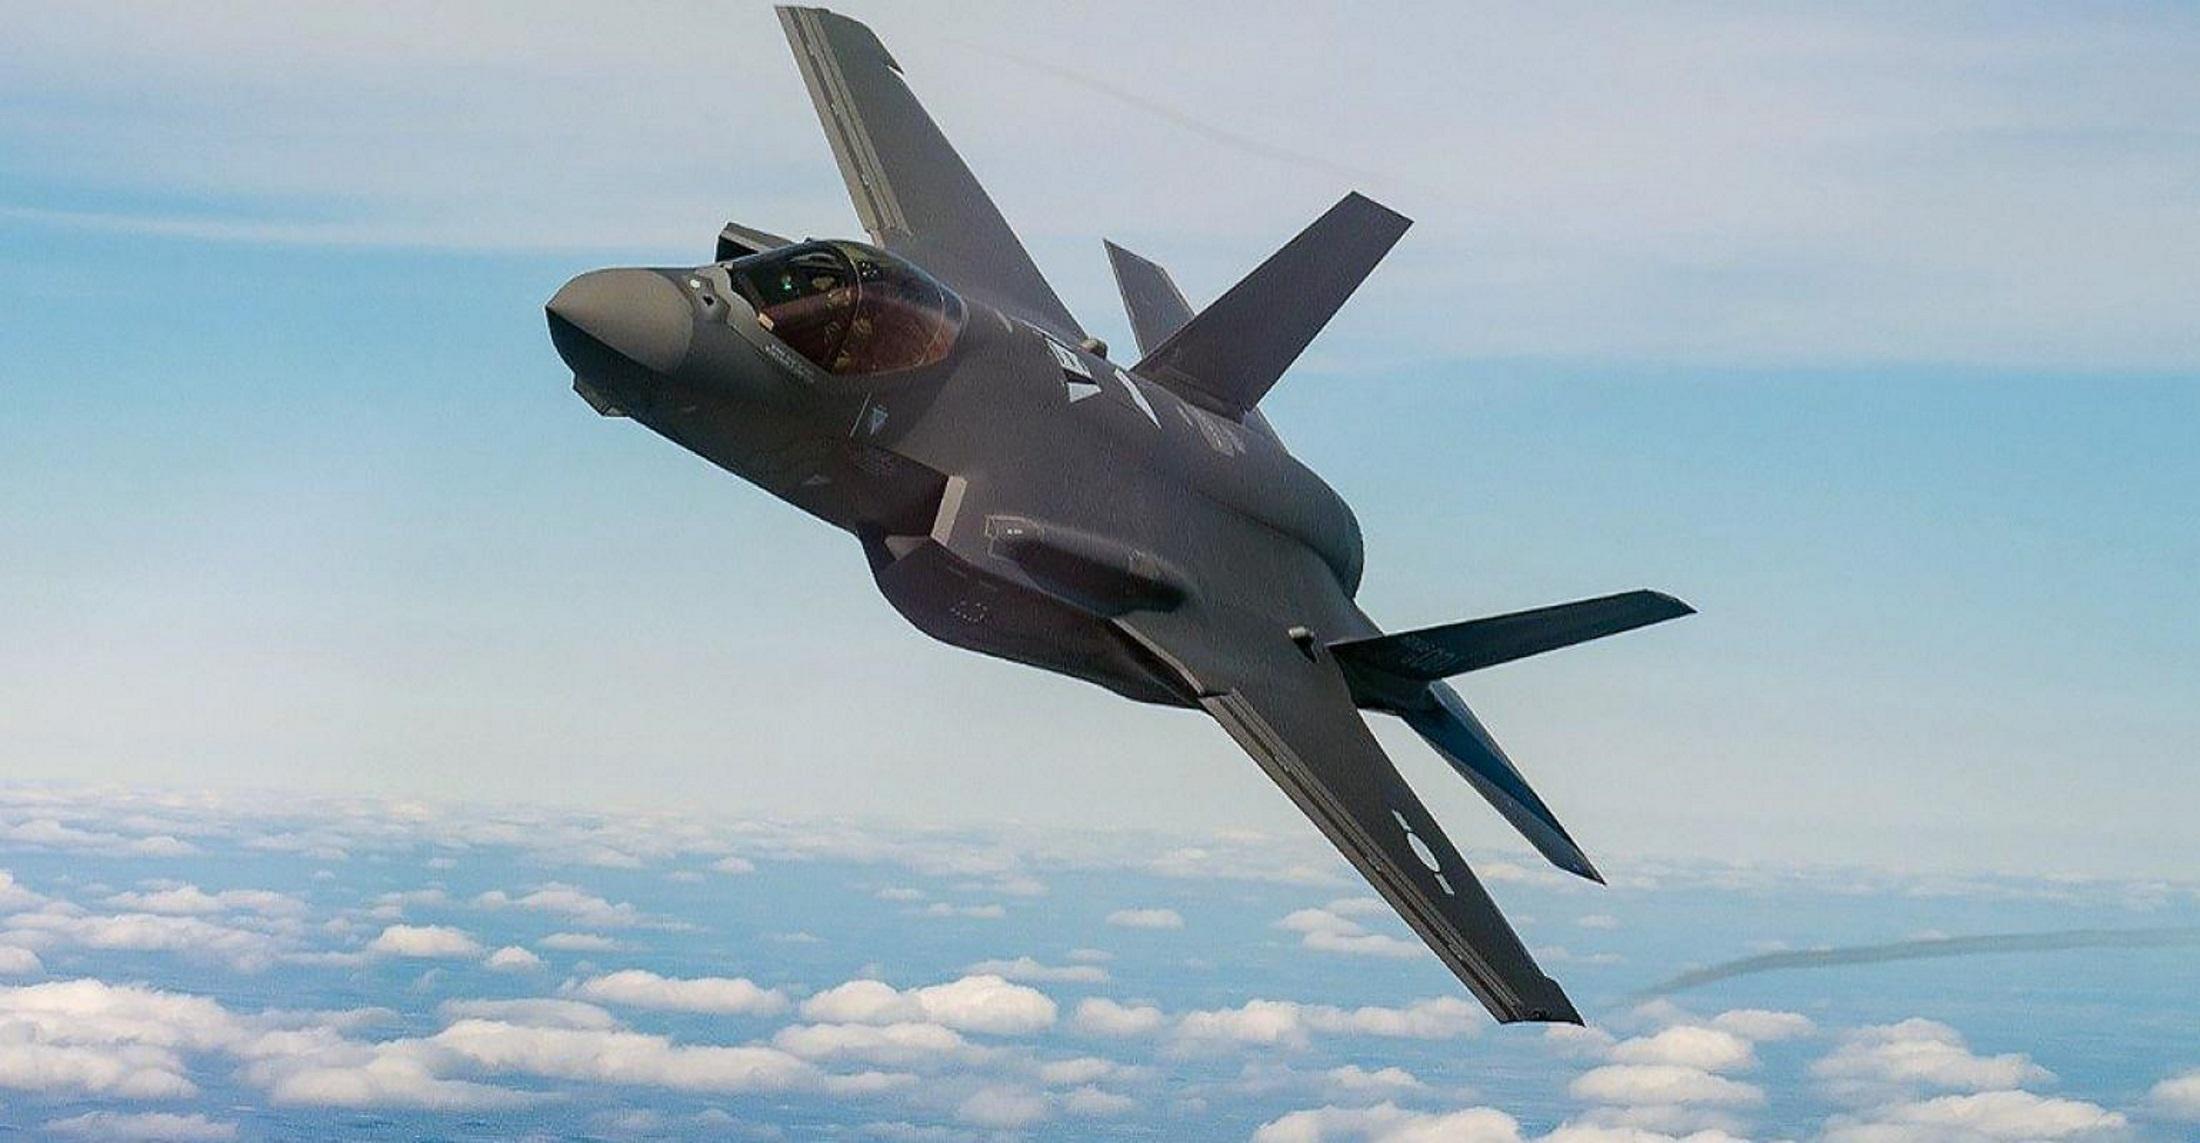 F-35: Το stealth μαχητικό αεροσκάφος γίνεται ακόμα πιο φονικό [video]